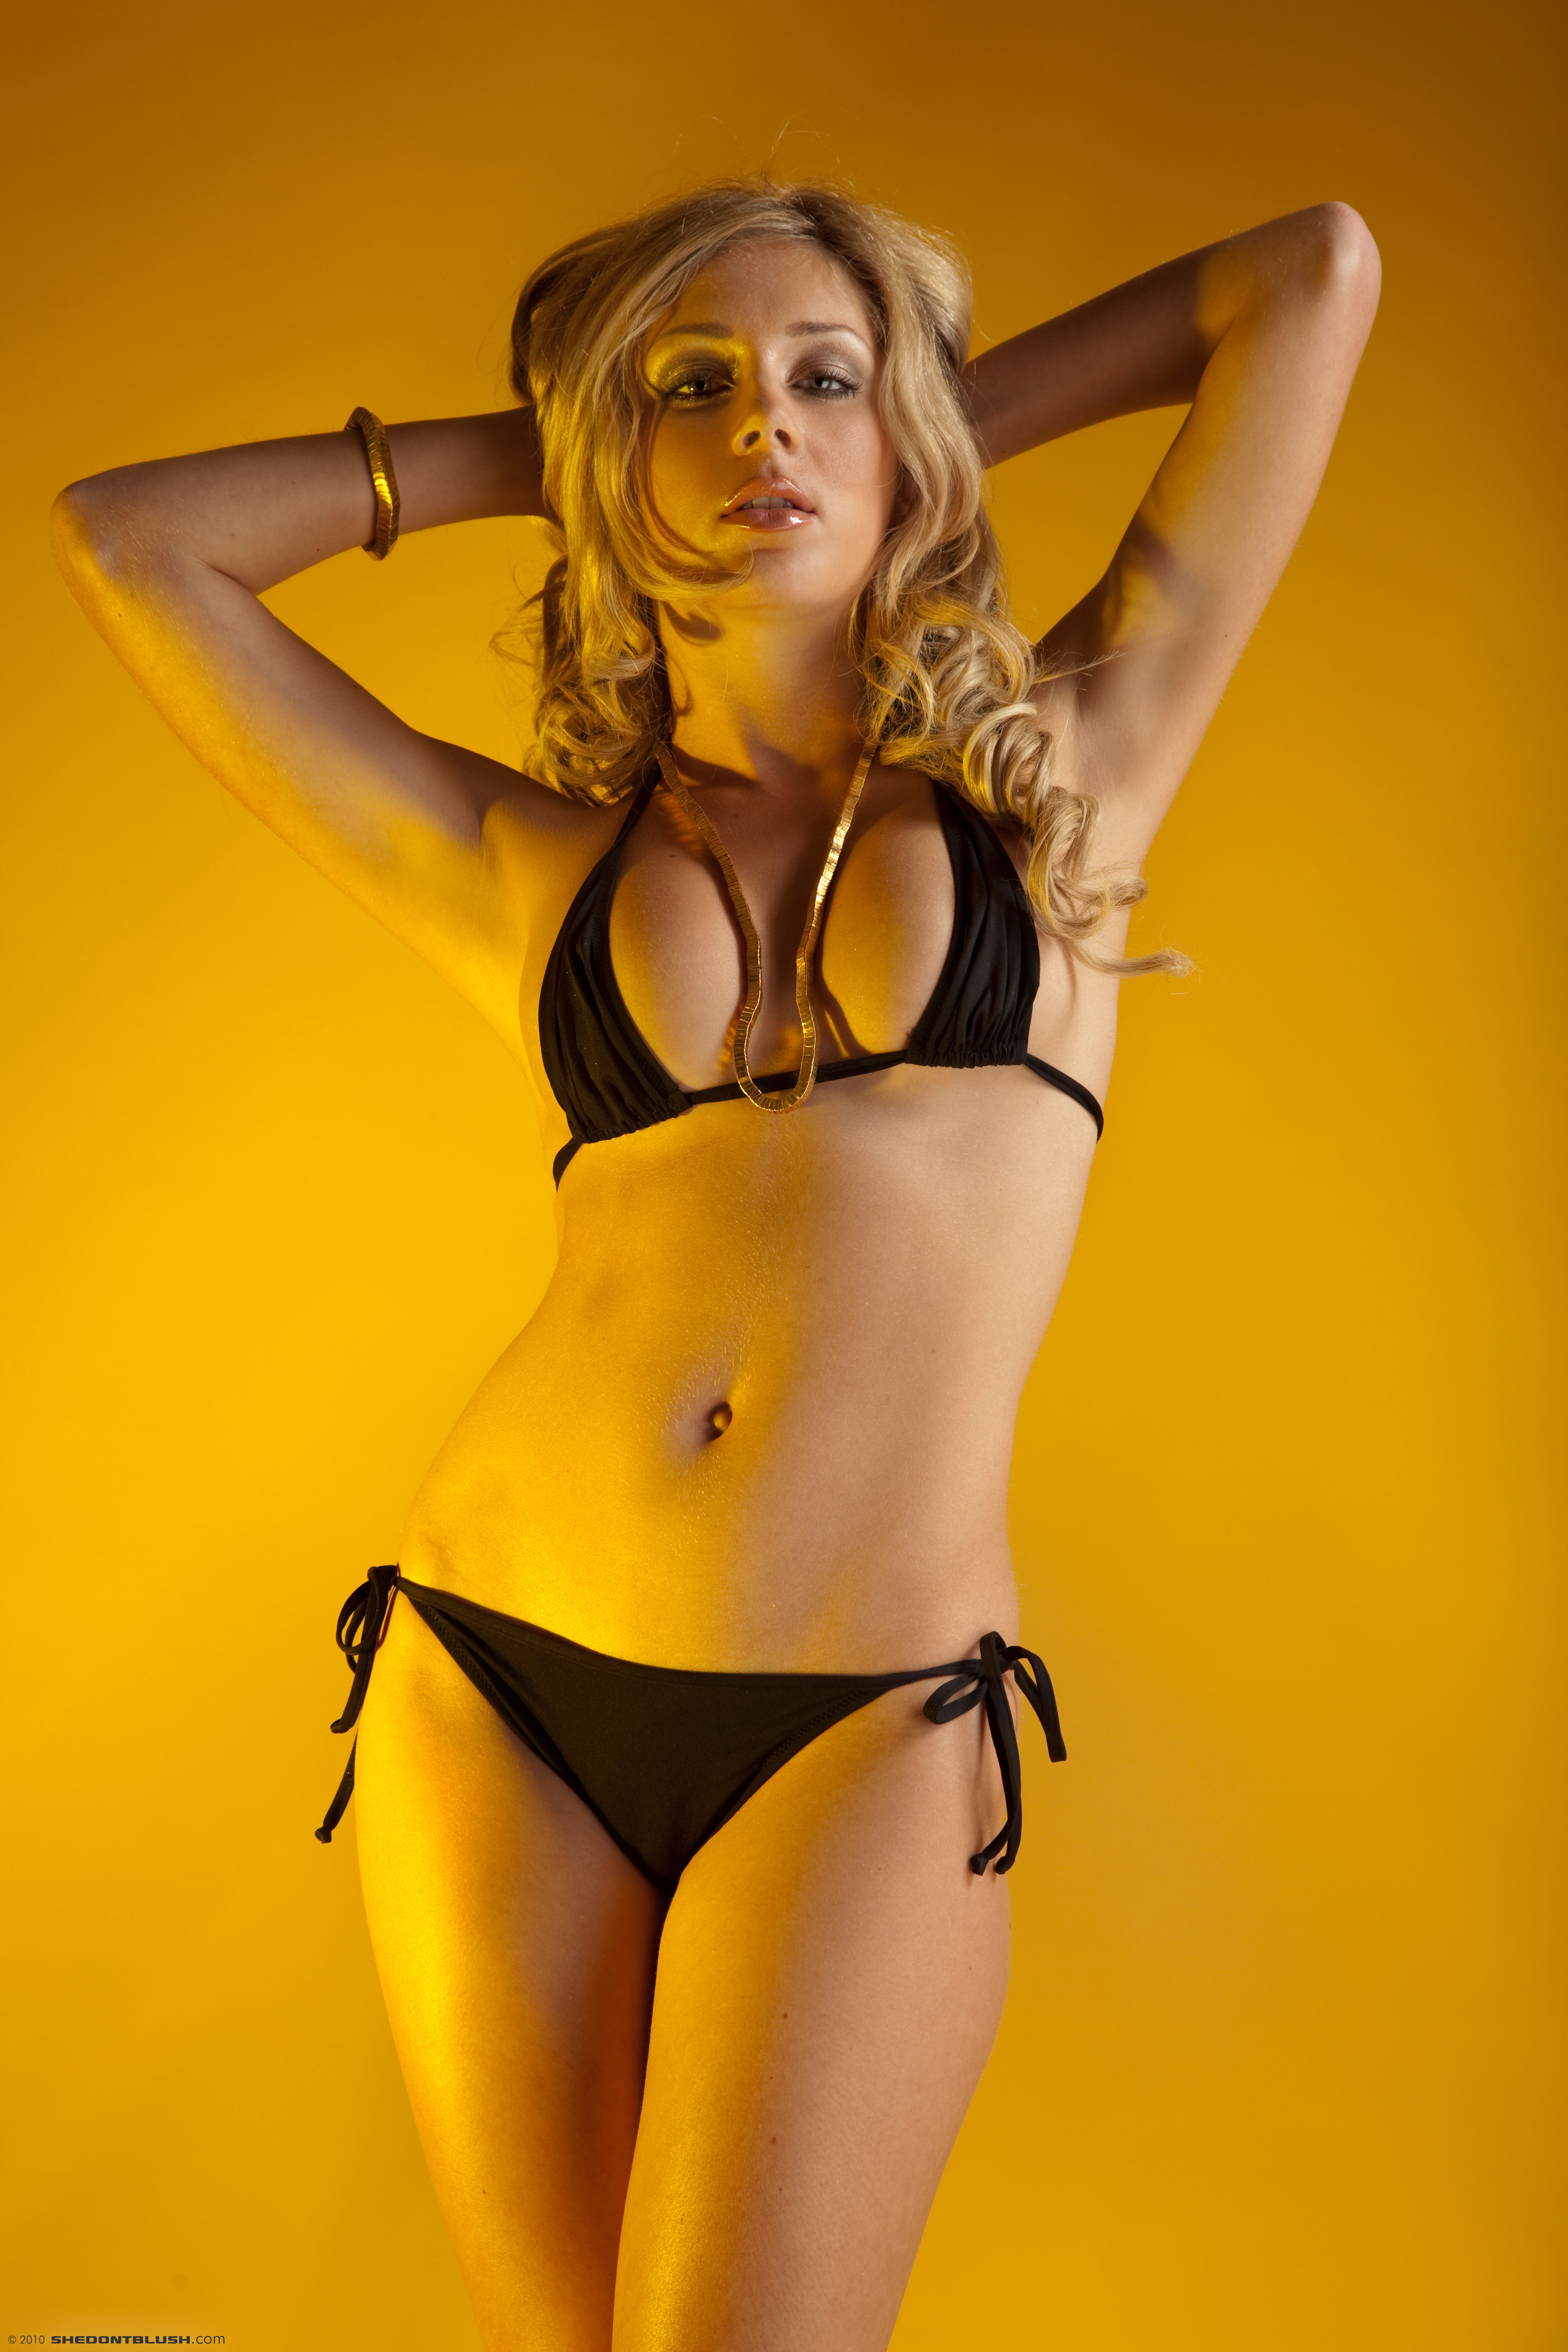 julia-crown-bikini-high-heels-shedontblush-02